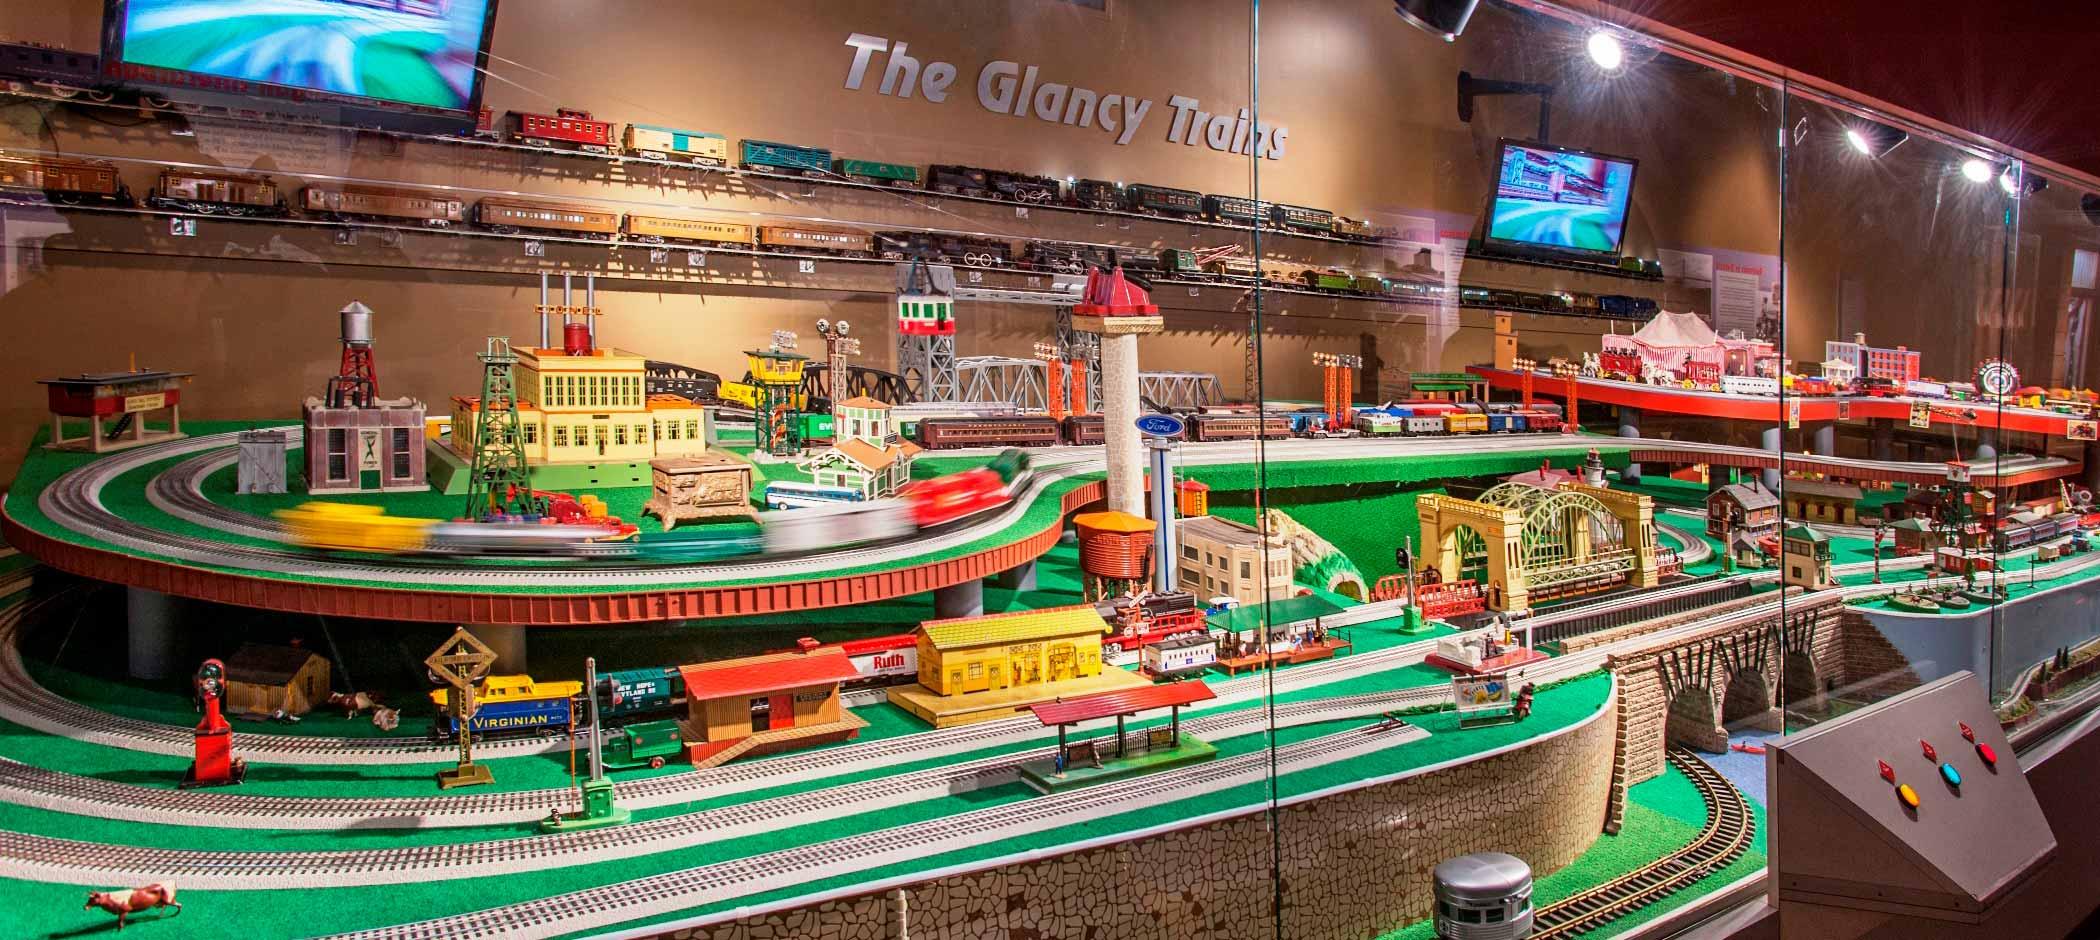 Detroit Historical Museum The Glancy Trains